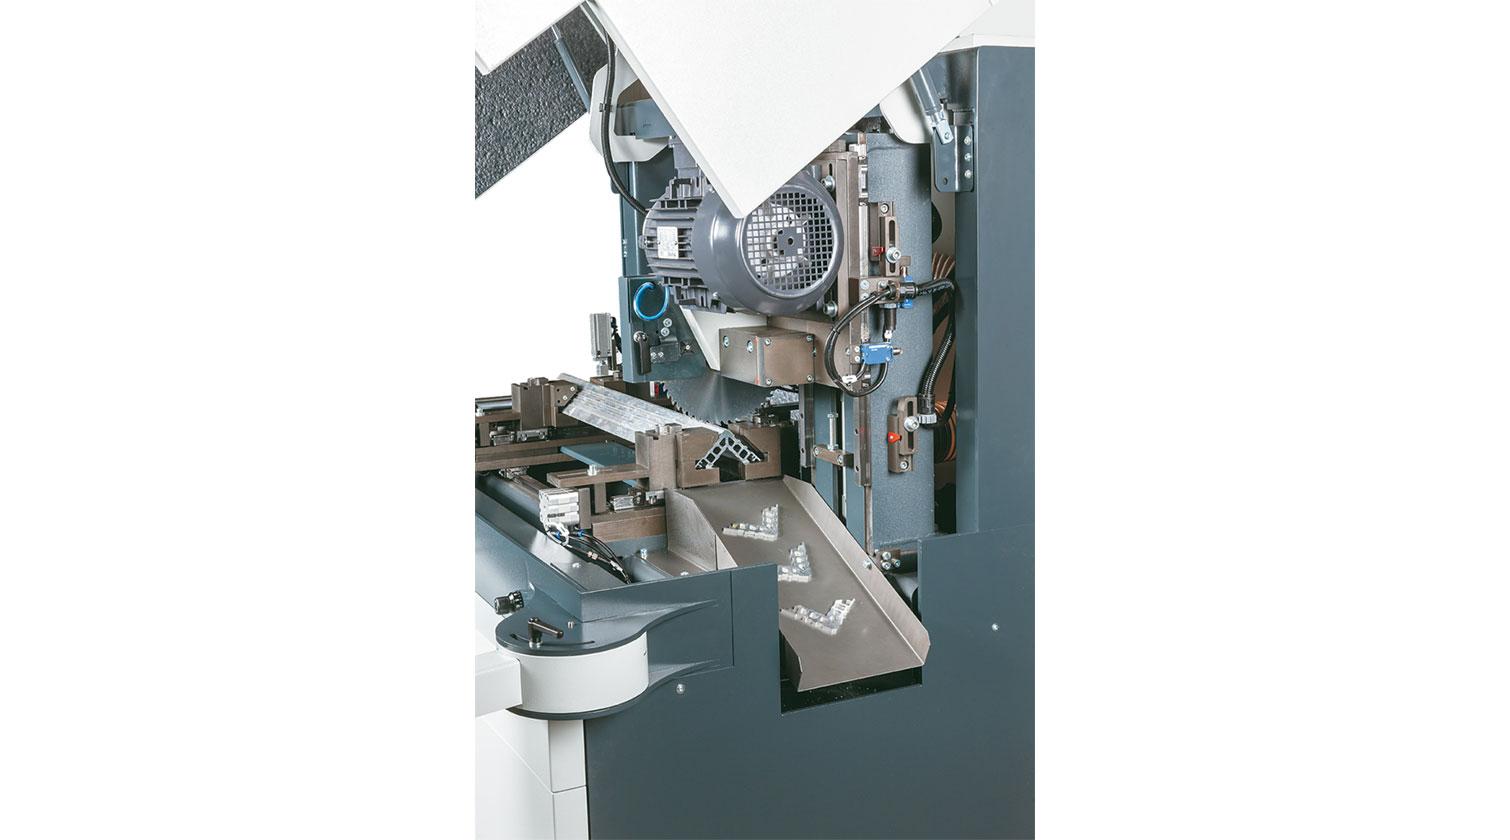 INT aluminum automatic saw Pressta Eisele Profilma 250 cutting